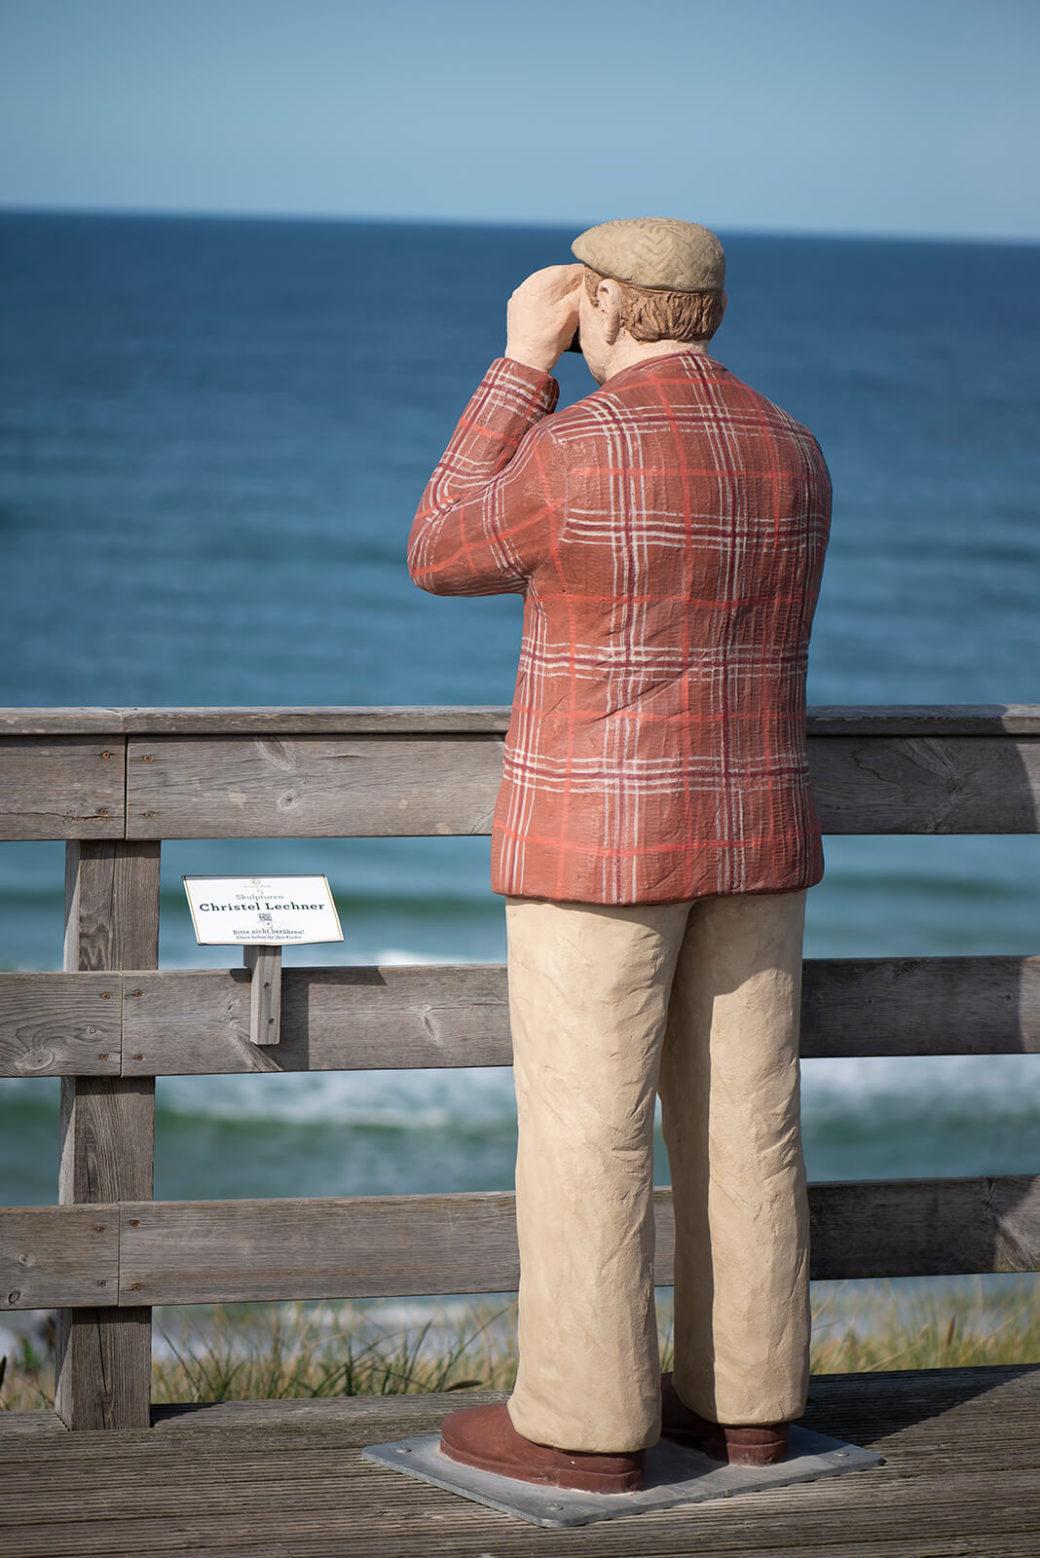 Christel Lechner: Mann mit Kamera(Foto: KUNST@SH/Jan Petersen, 2020)